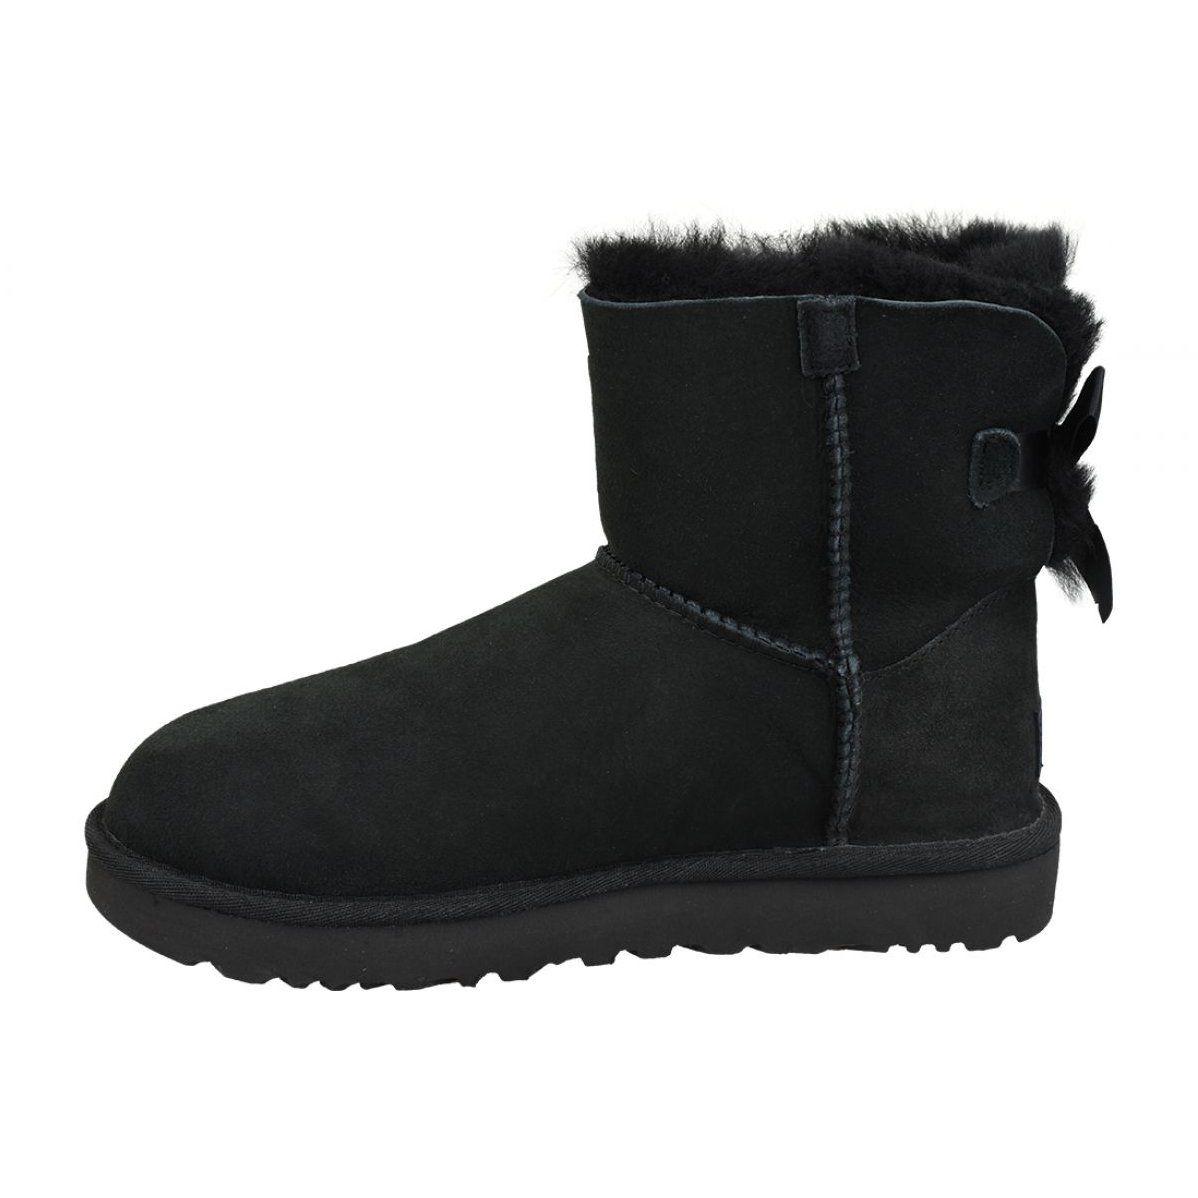 Buty Ugg Mini Bailey Bow Ii W 1016501 Blk Czarne Ugg Mini Boots Womens Boots